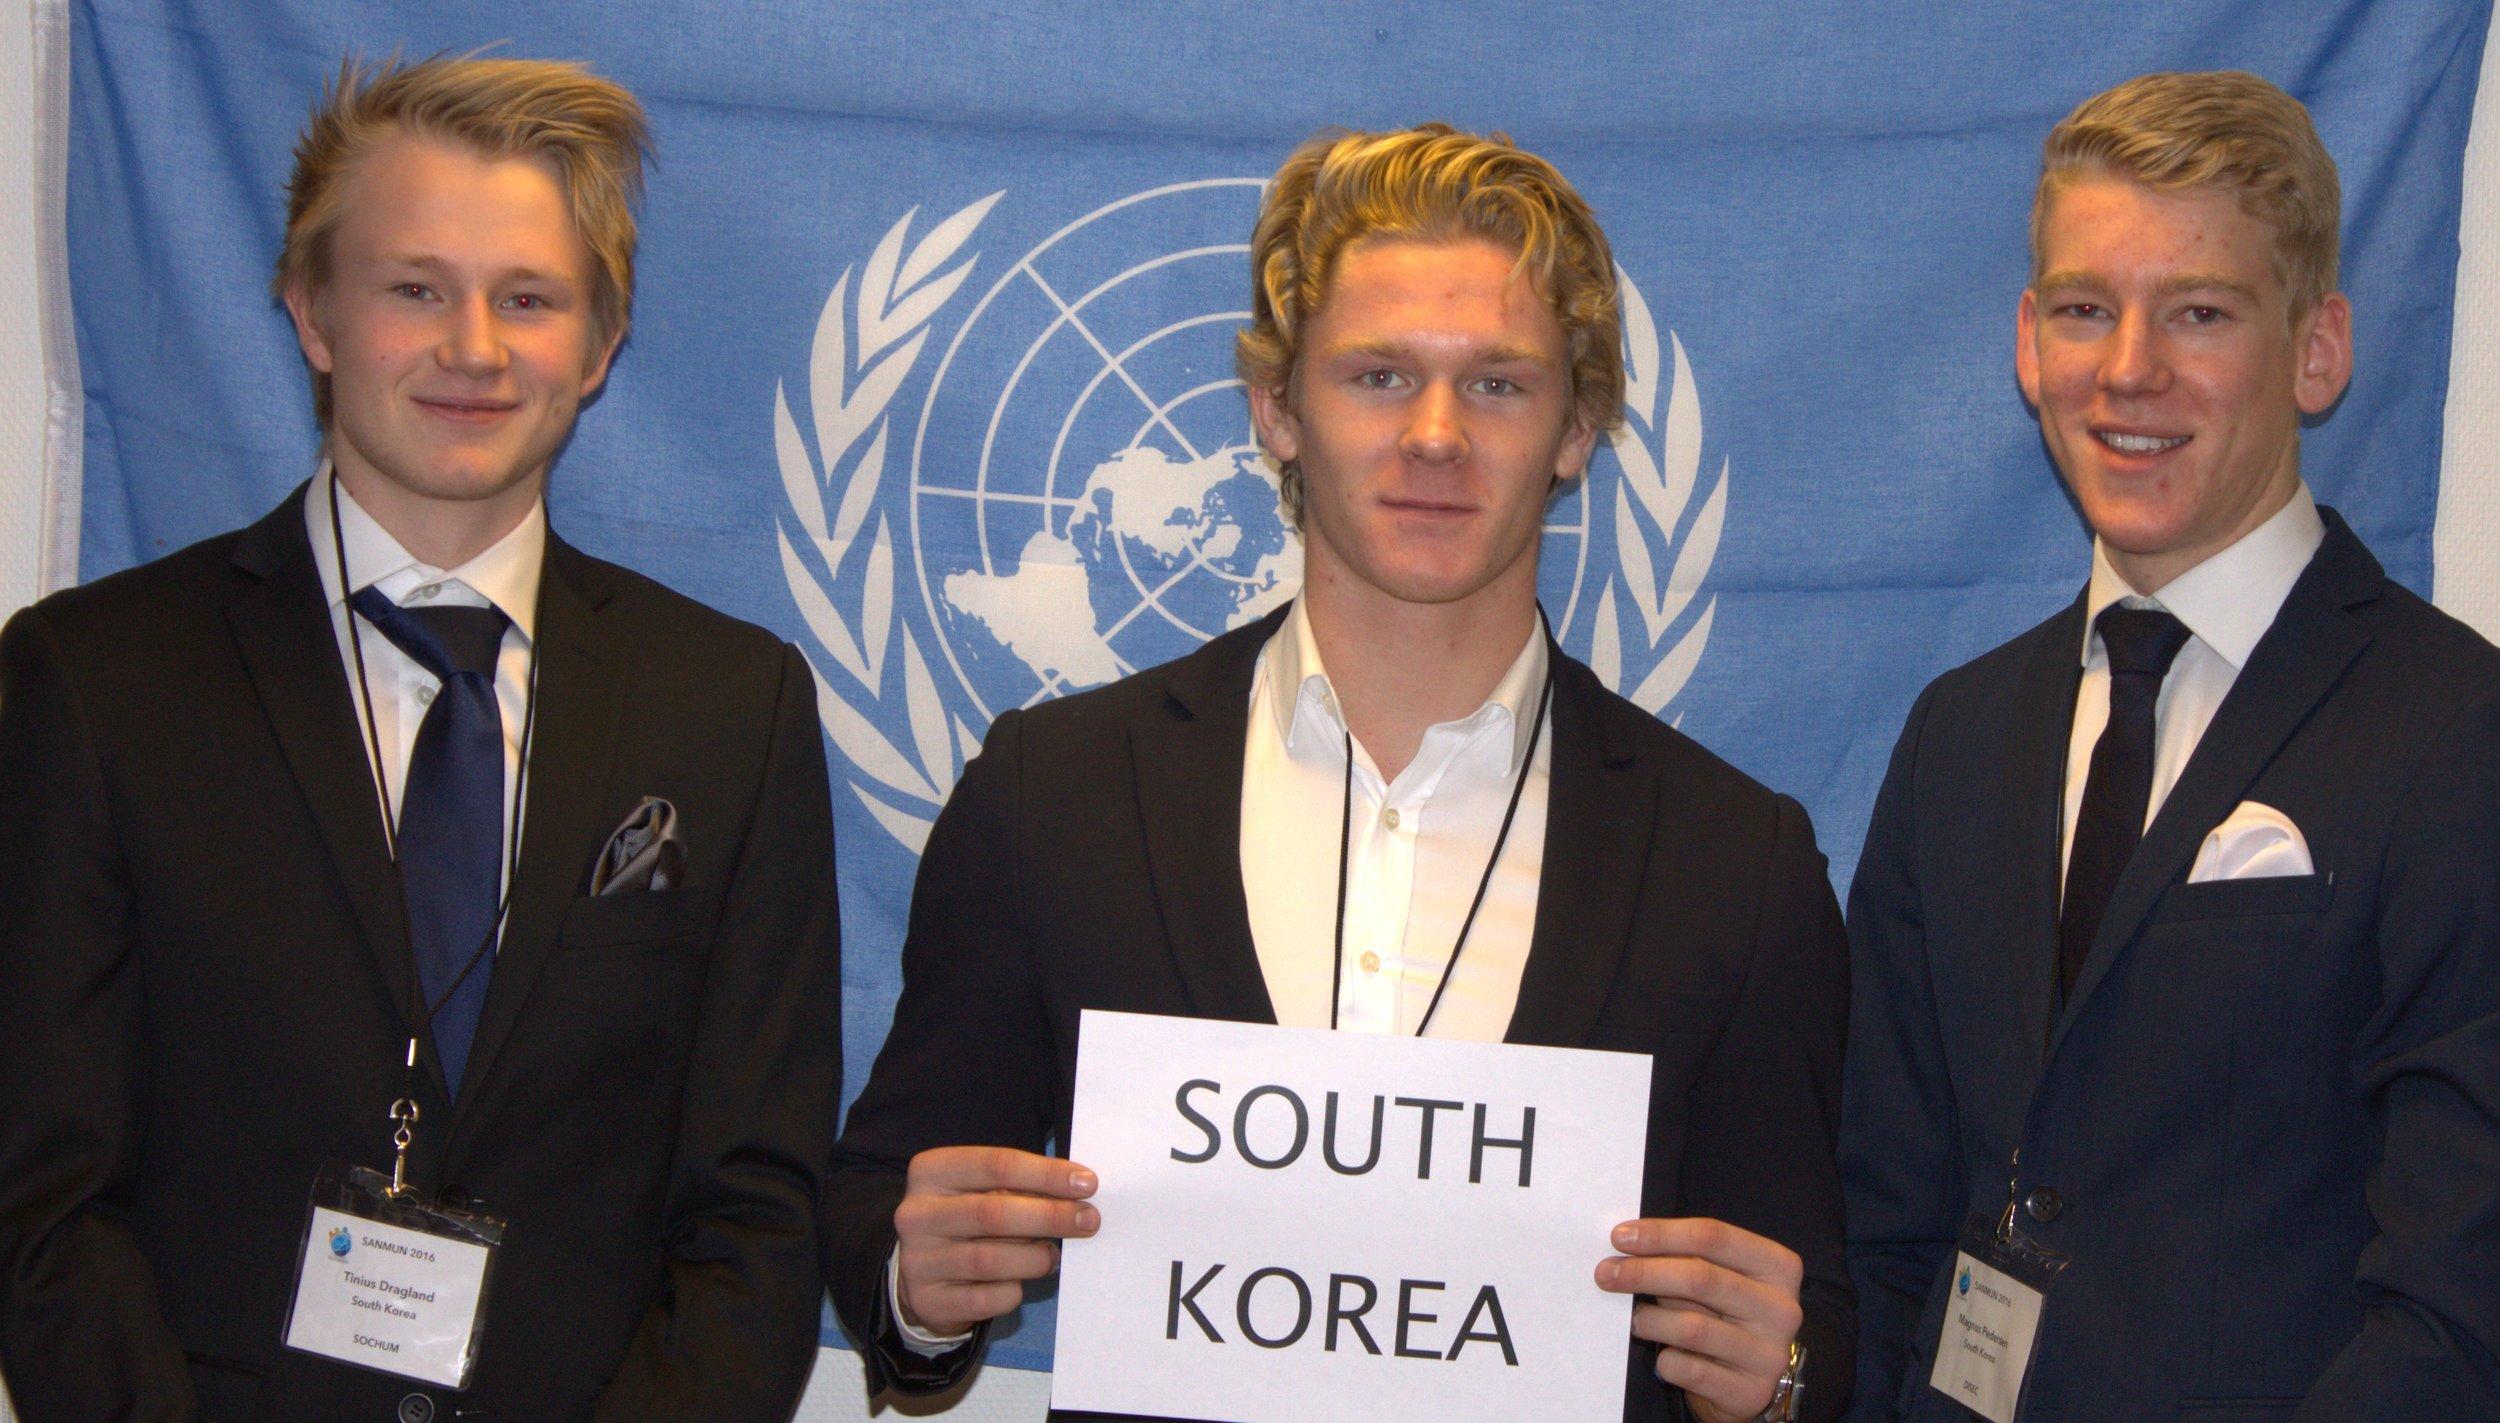 South Korea.jpg